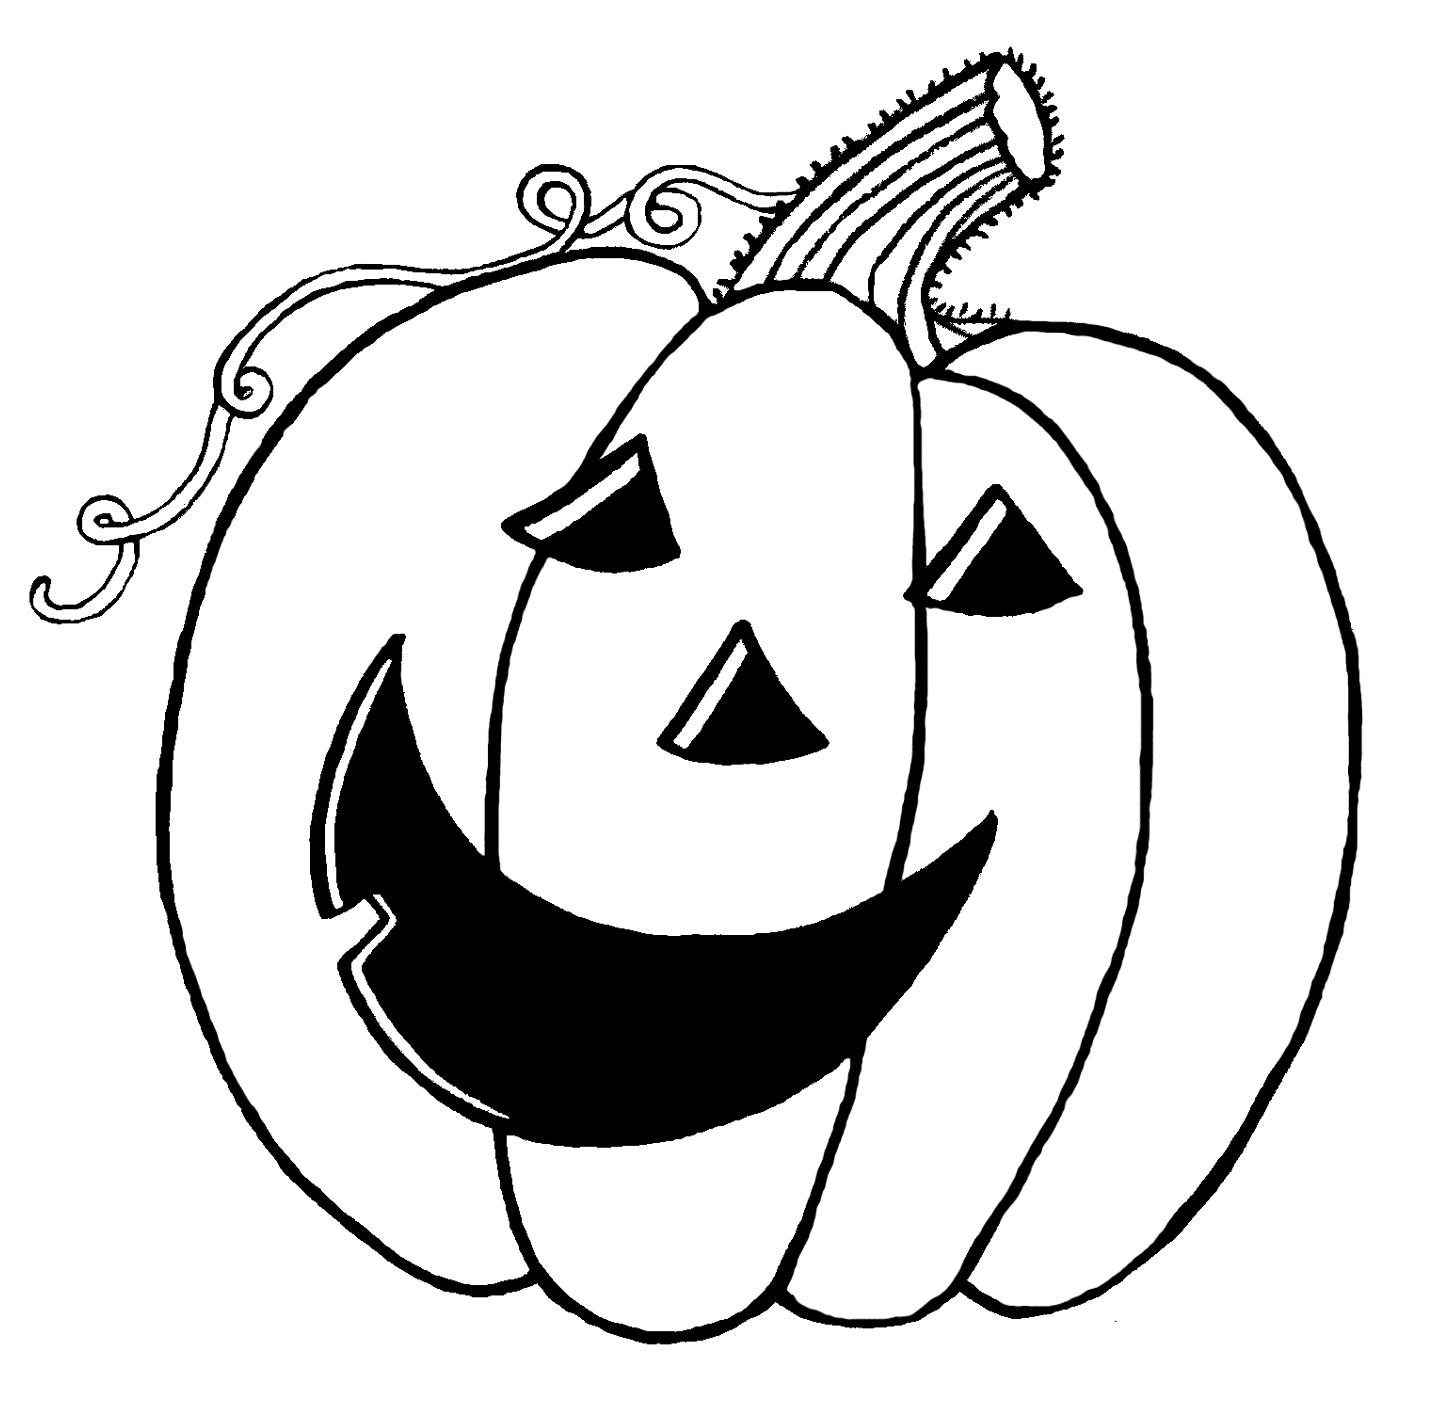 Happy Jack O Lantern Faces - AZ Coloring Pages